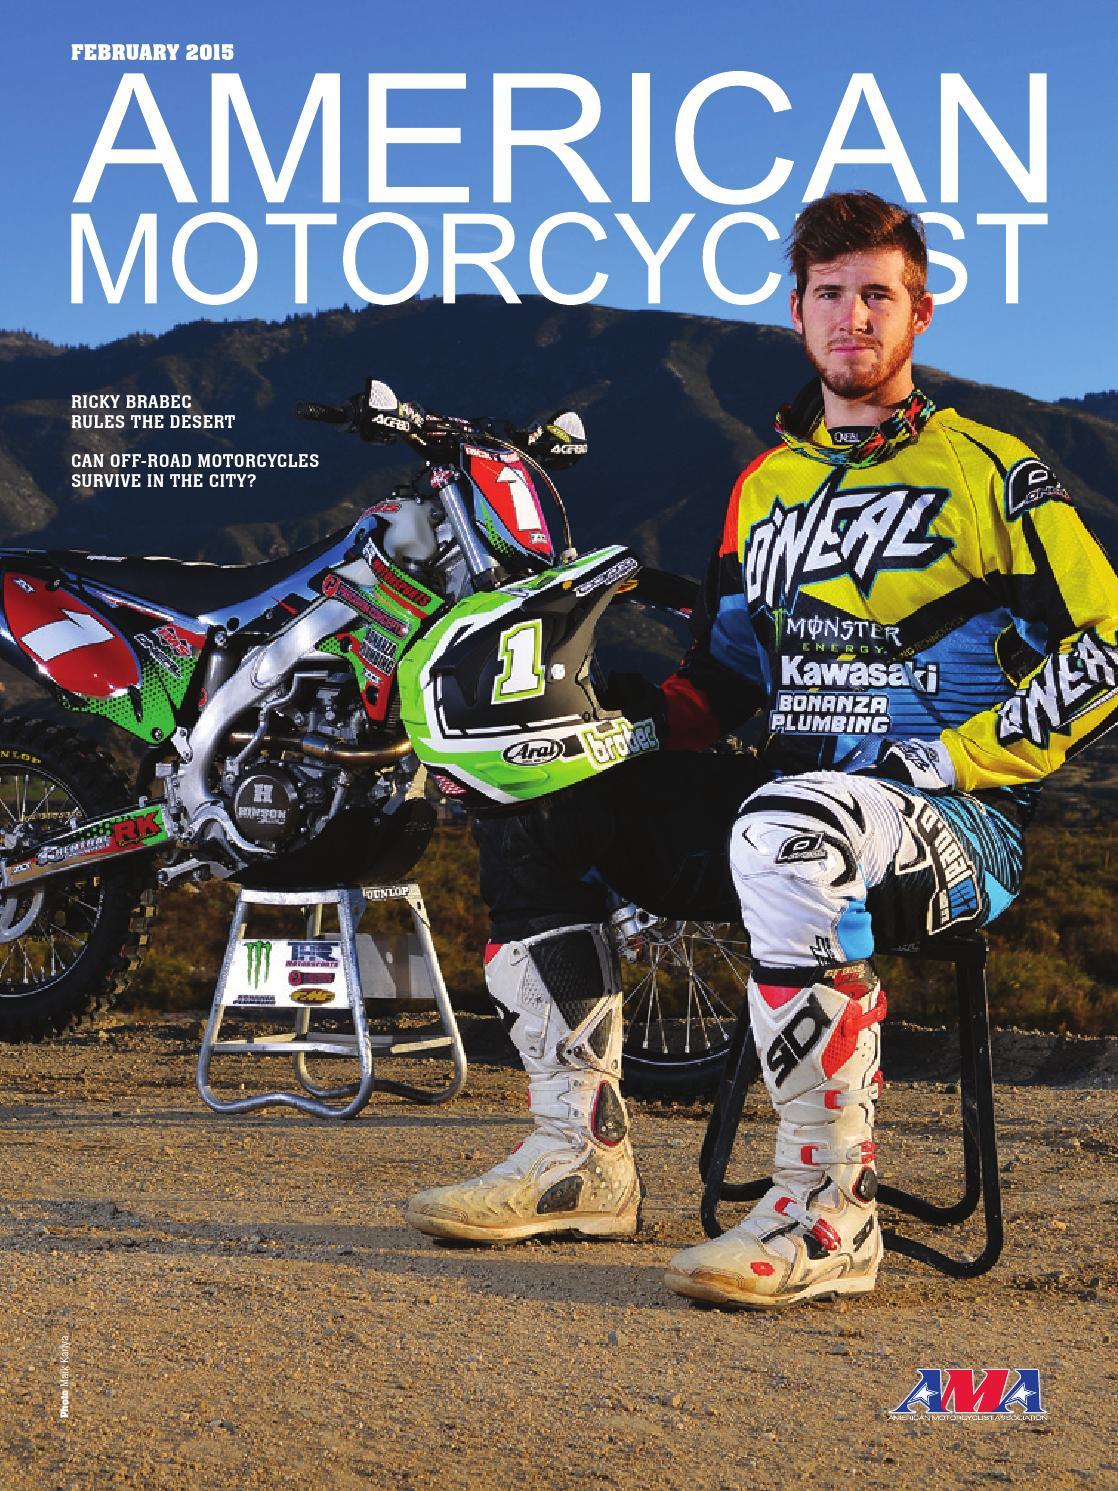 American Motorcyclist February 2015 Dirt Version